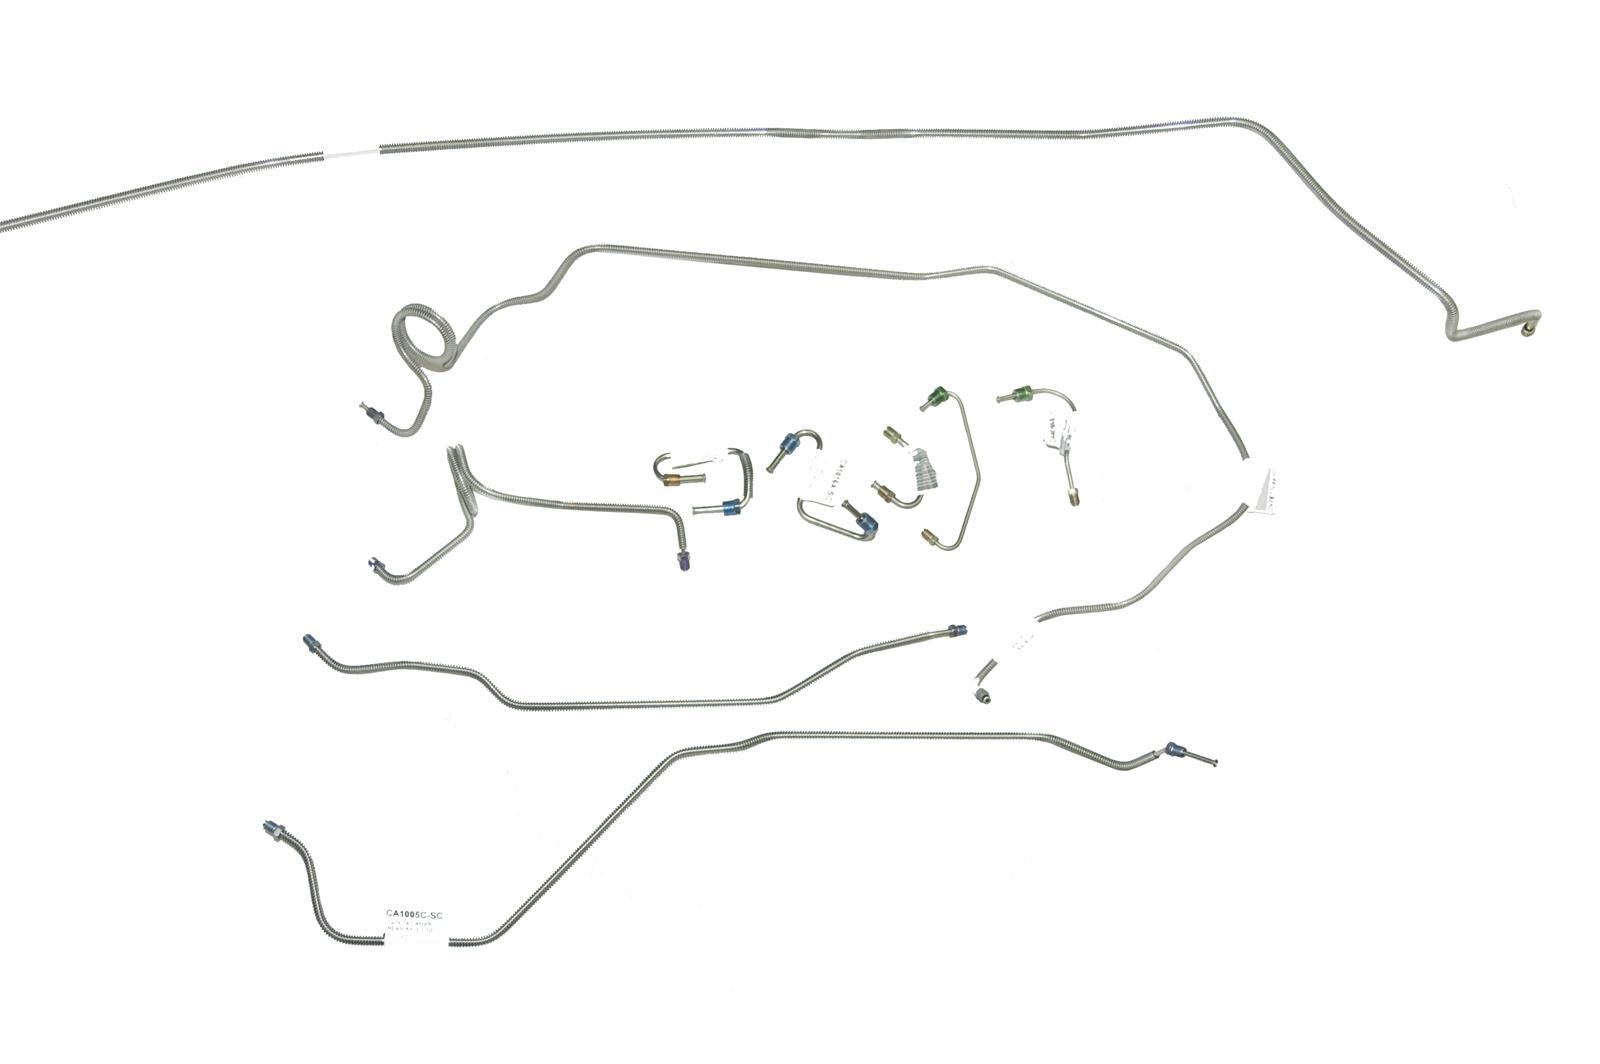 2001 mazda tribute exhaust system diagram prokaryotes and eukaryotes venn free wiring for ford f250 systems imageresizertool com ranger parts